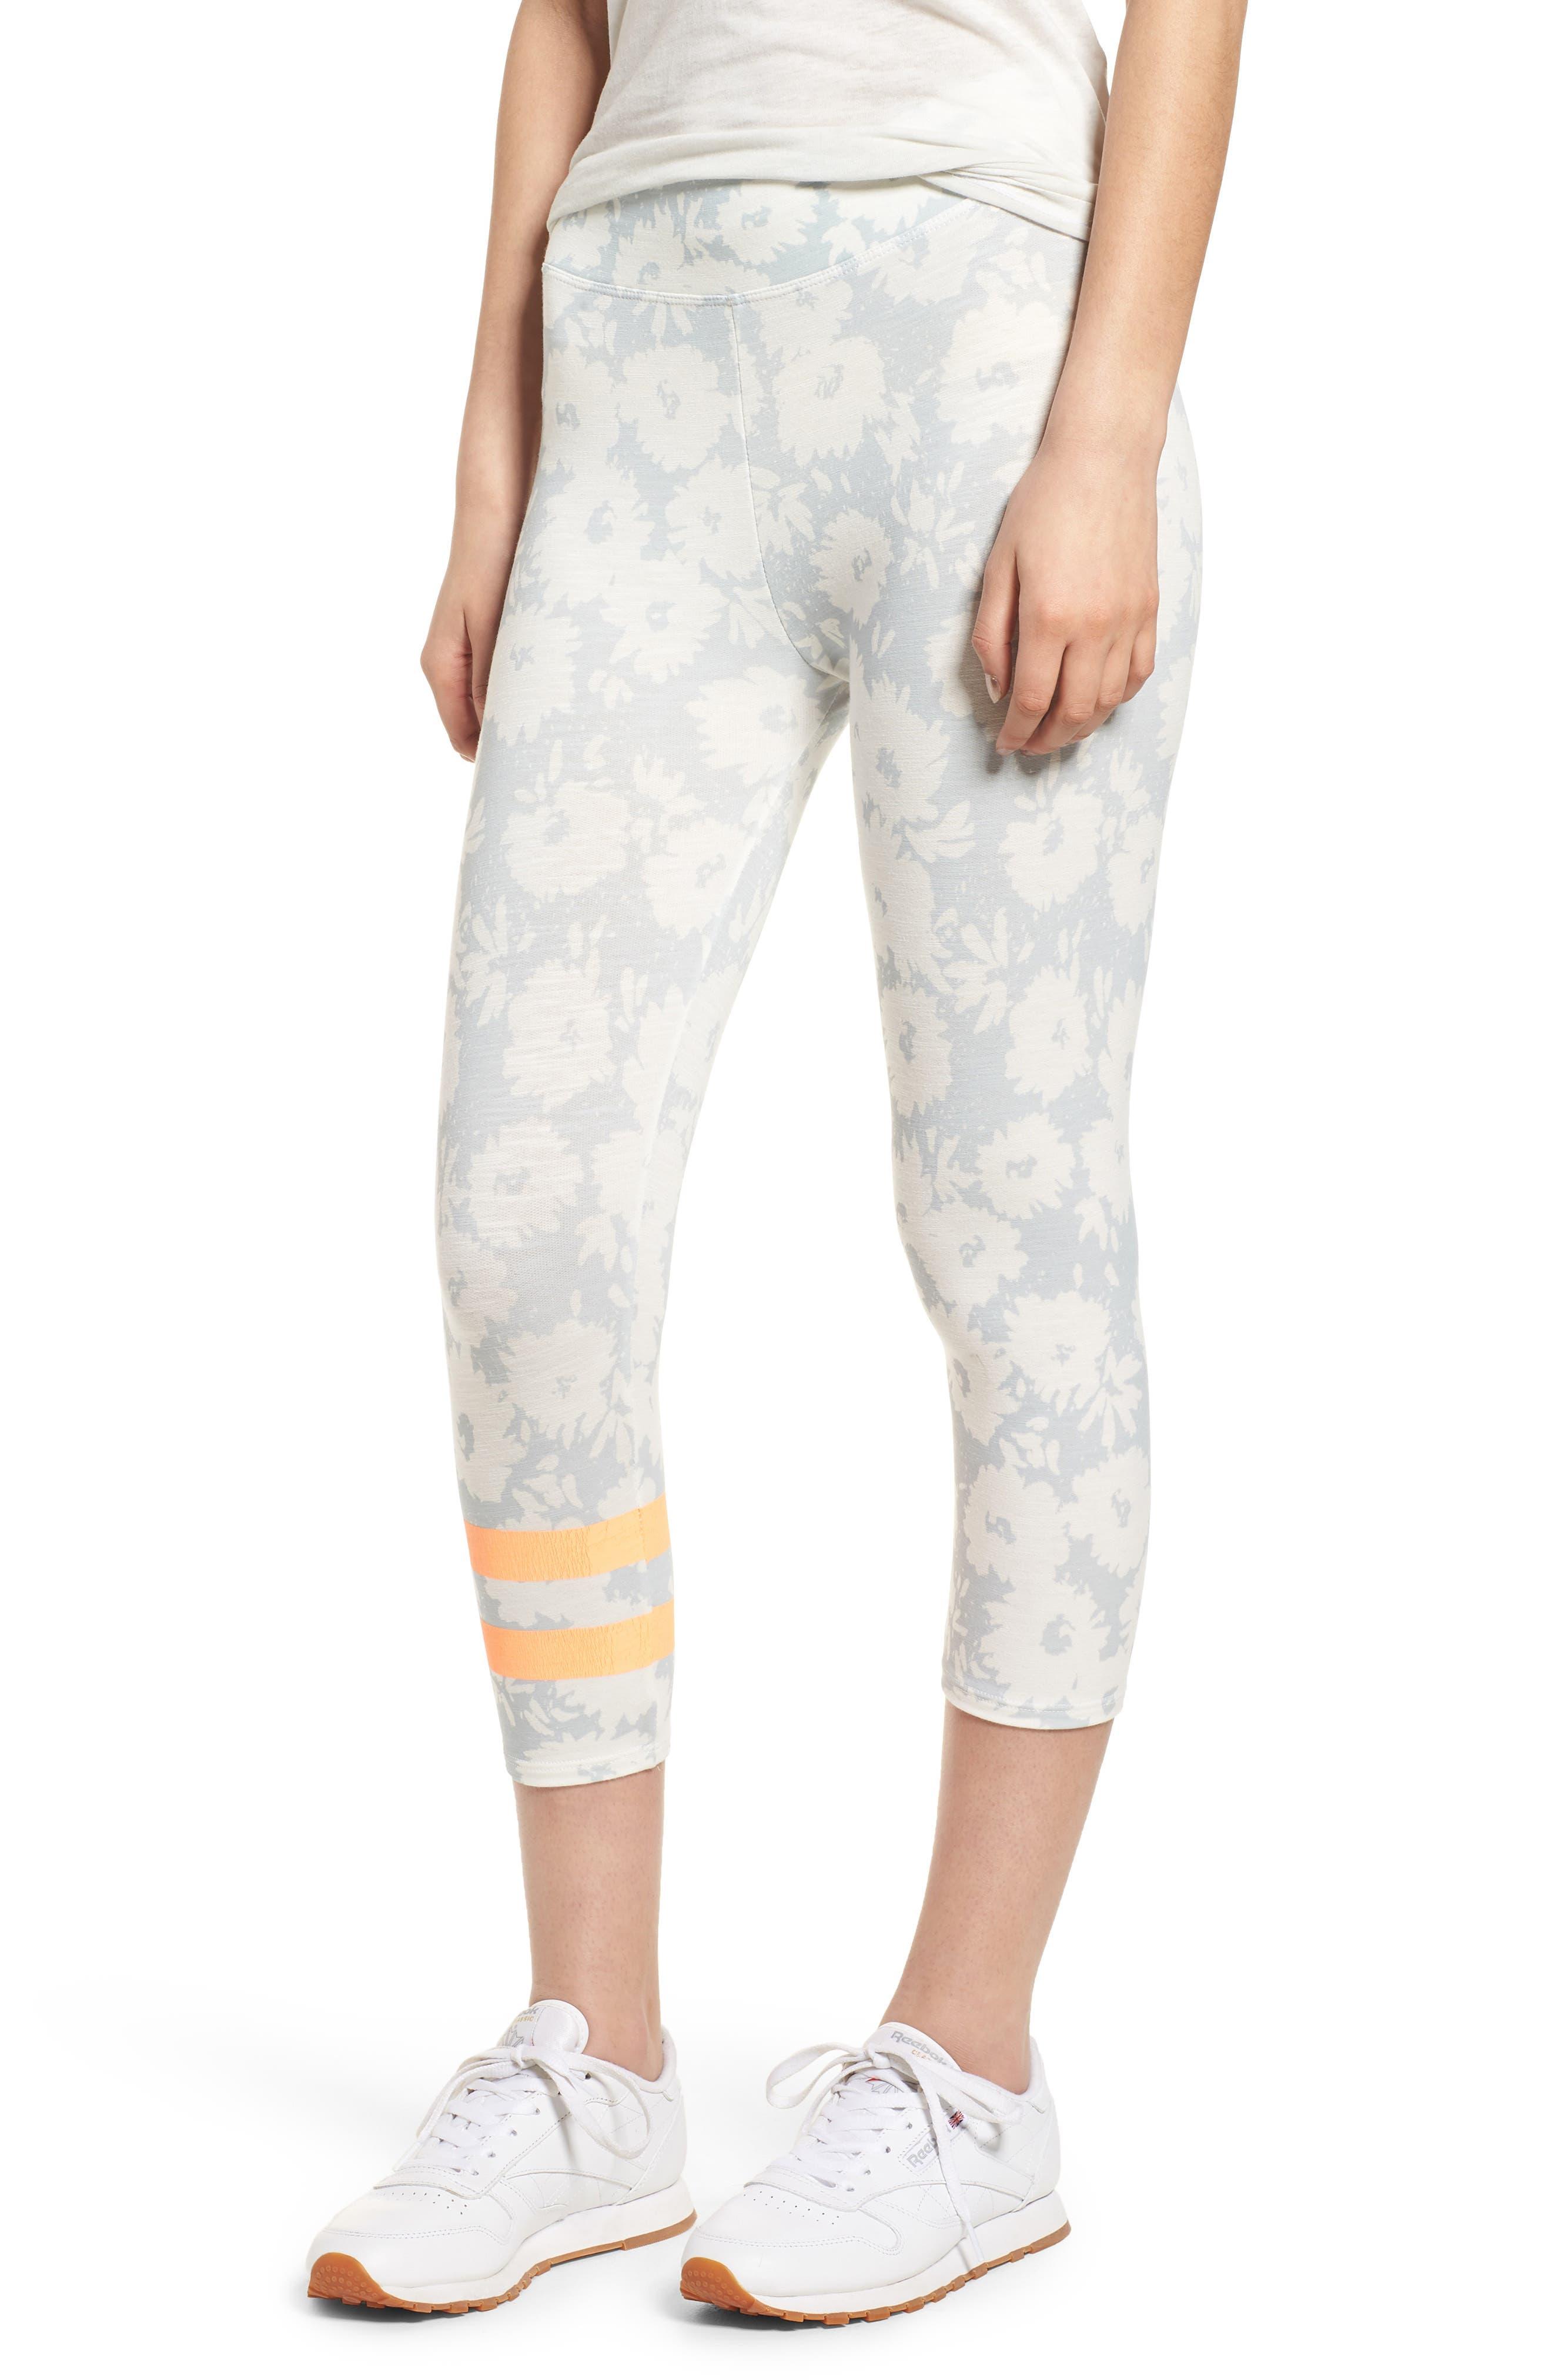 Stripe Print Capri Yoga Pants,                         Main,                         color, 451